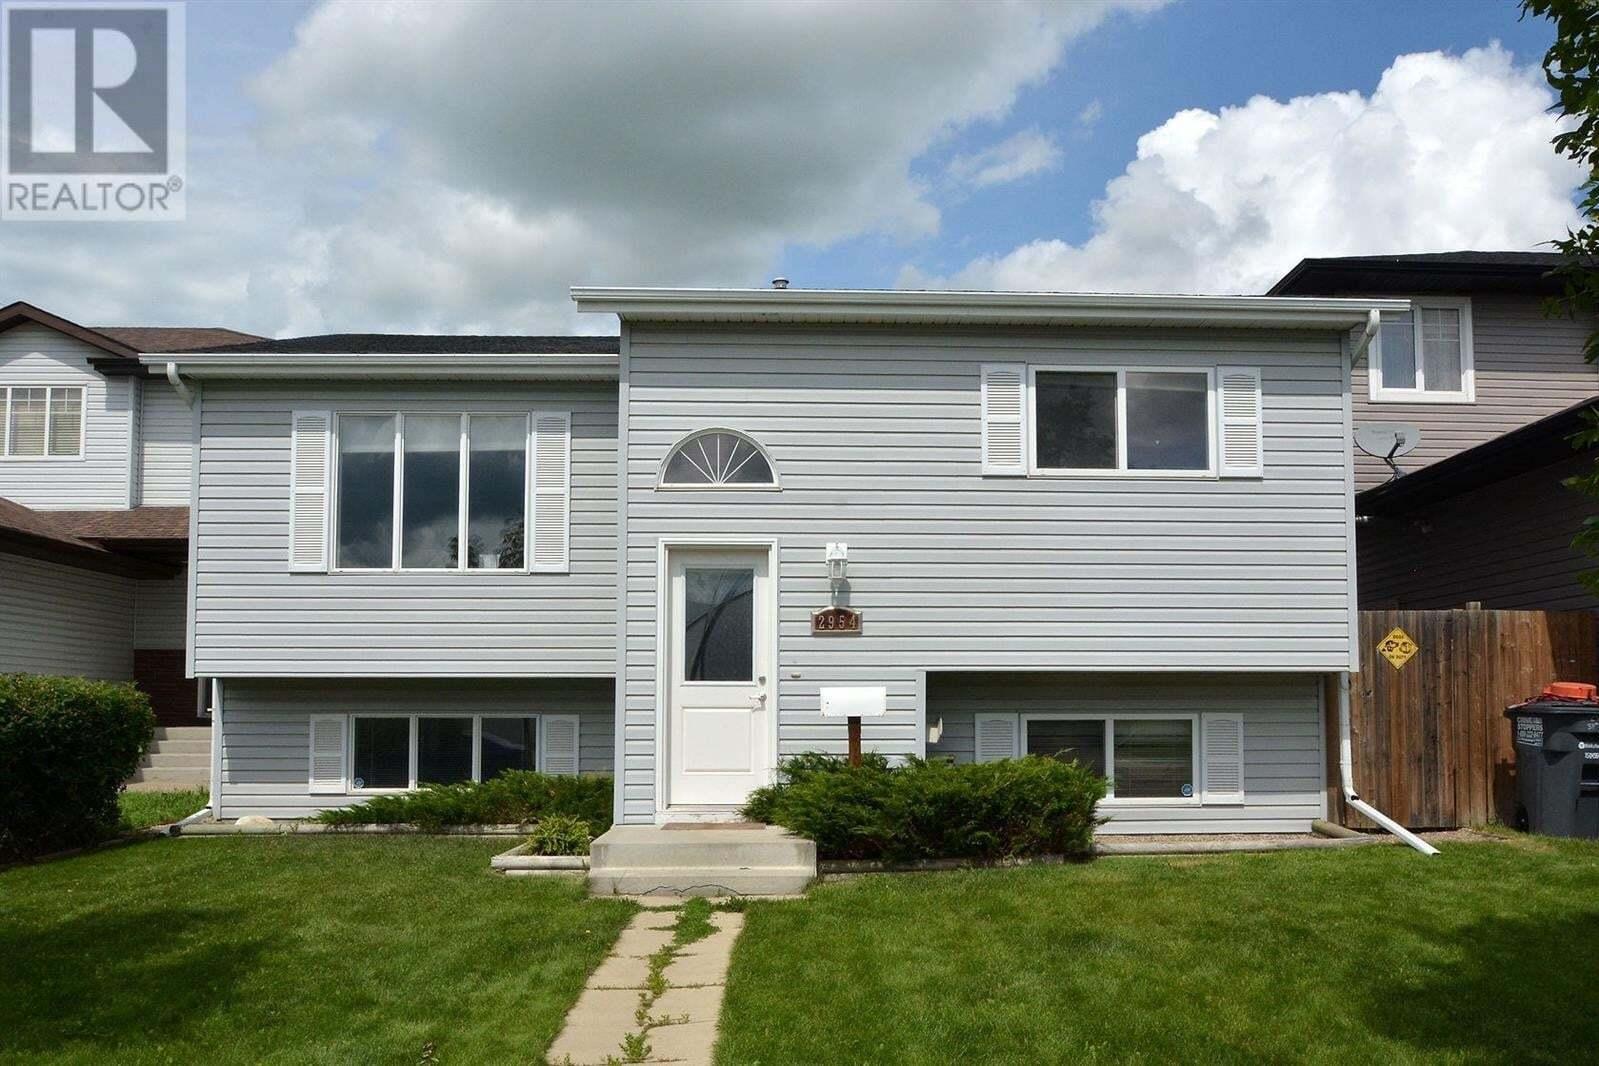 House for sale at 2954 37th St W Saskatoon Saskatchewan - MLS: SK820814